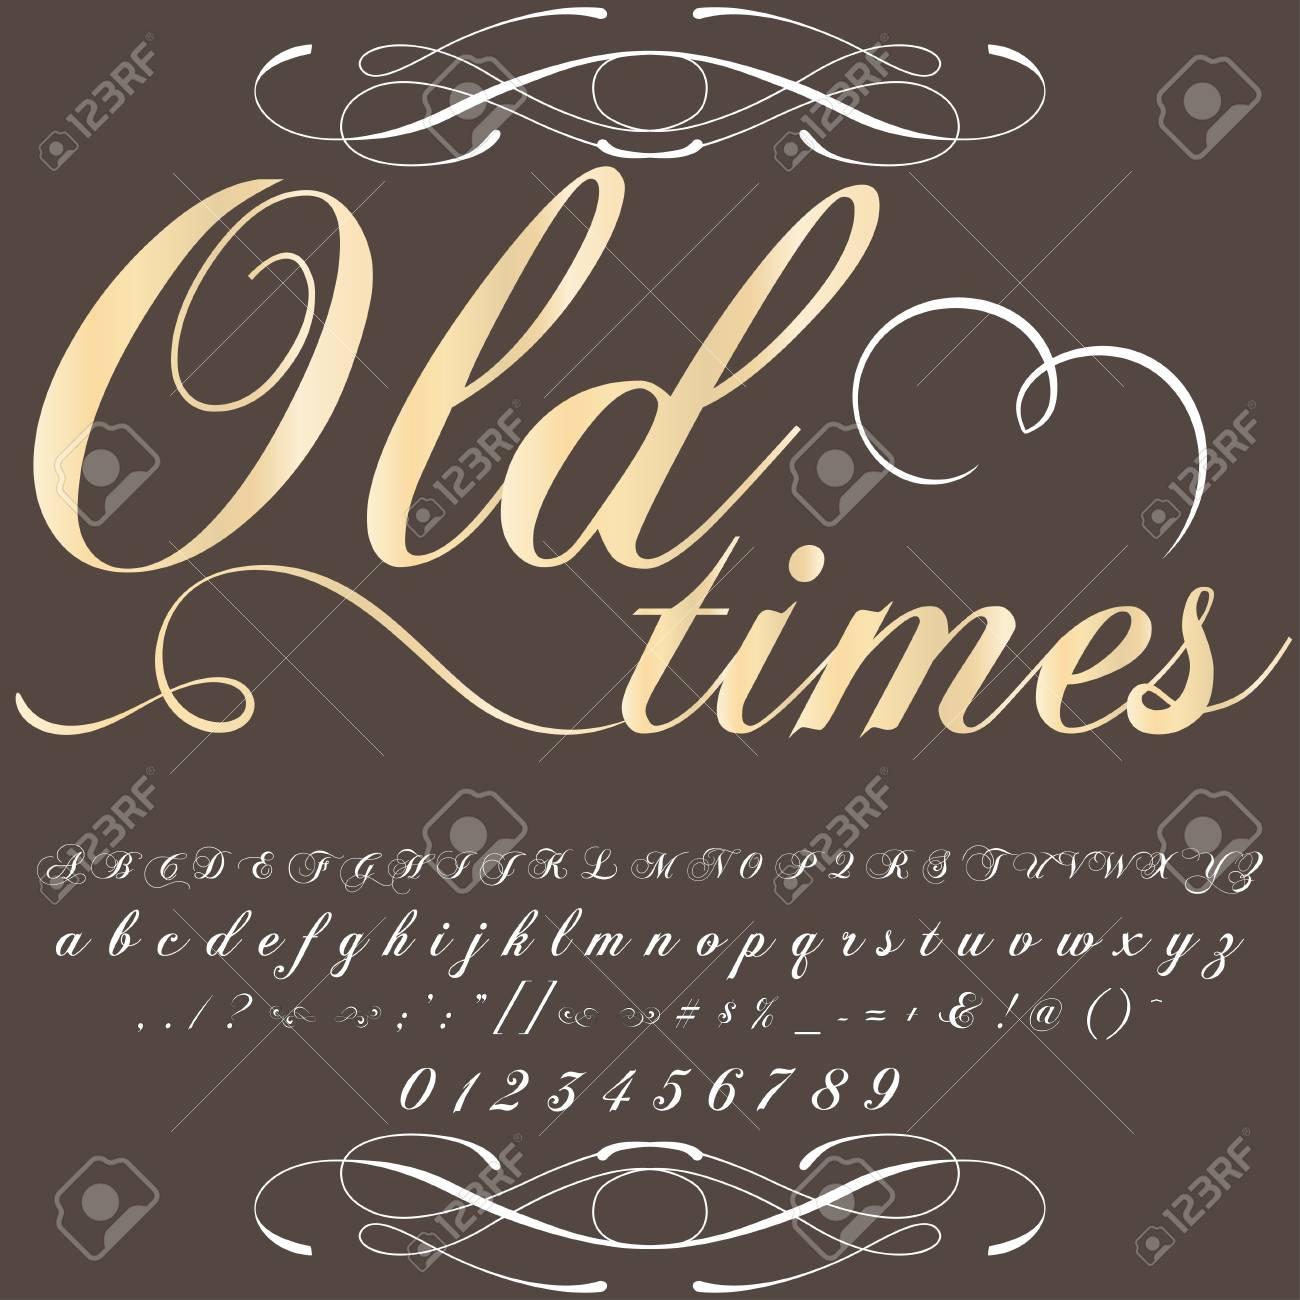 Font Typeface Old times vintage script font Vector typeface for